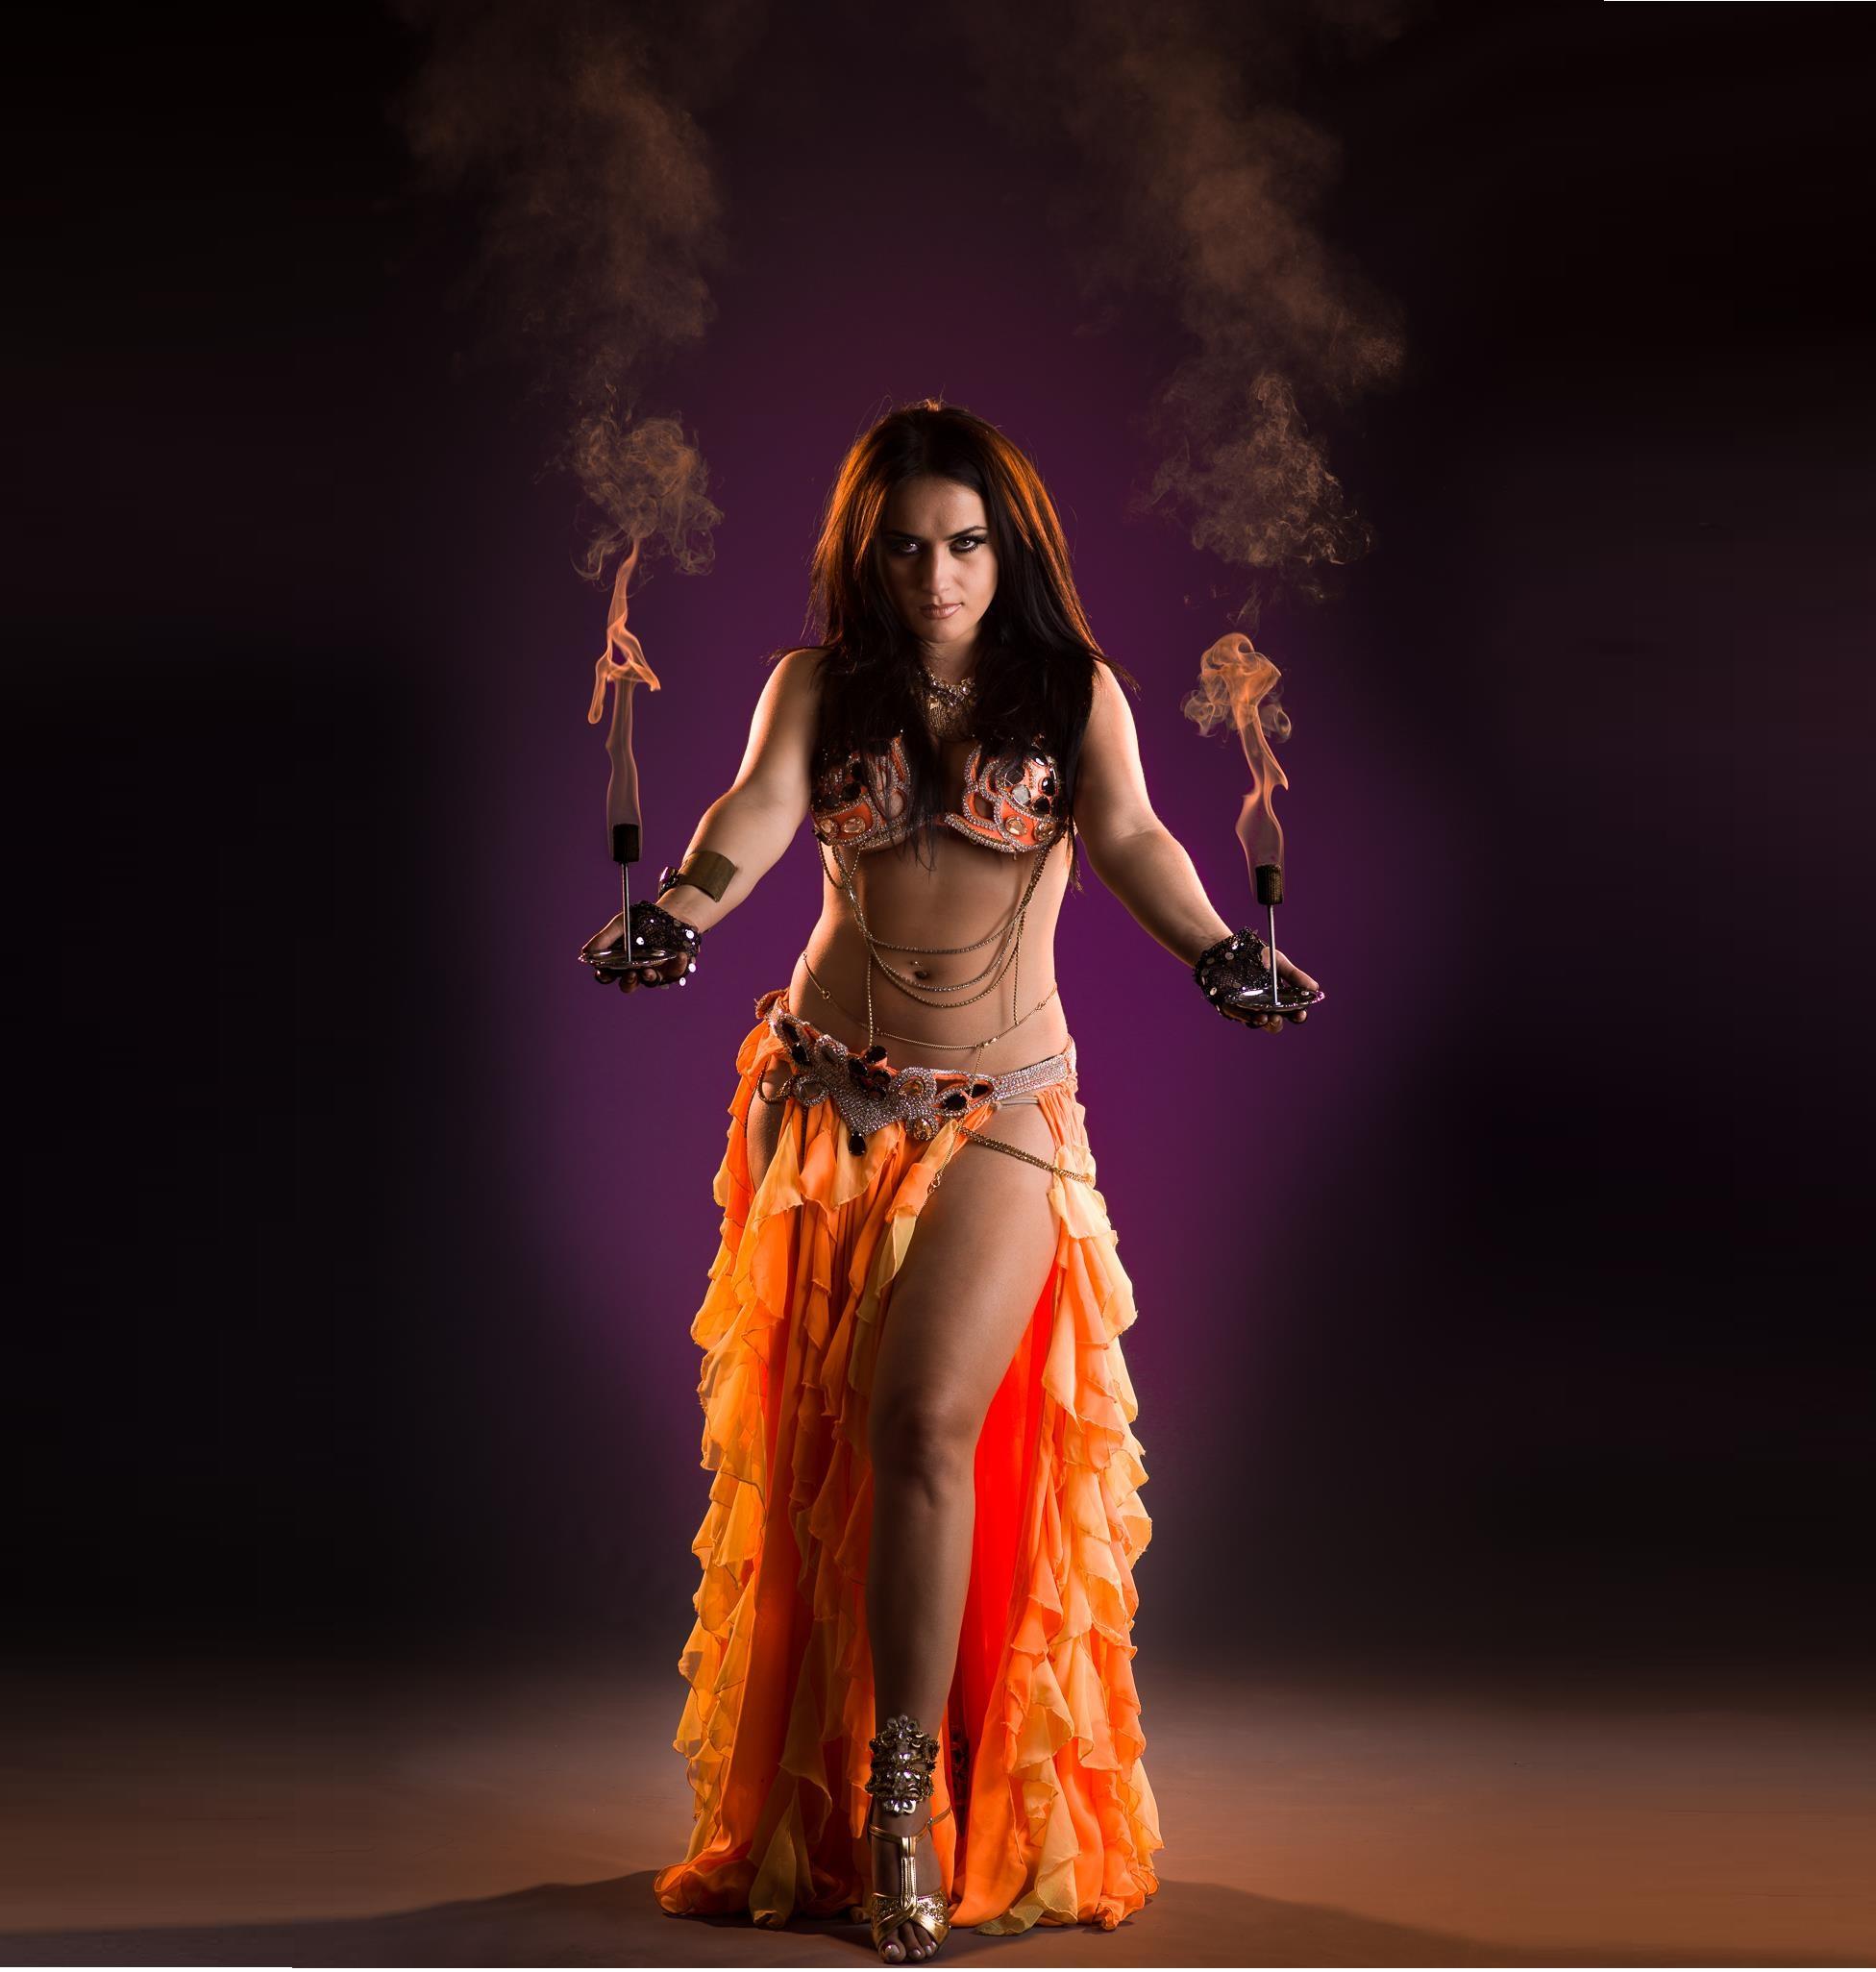 ivanna- Belly Dance LatinBallroomDance Studio NJ - Copy - Copy.jpg